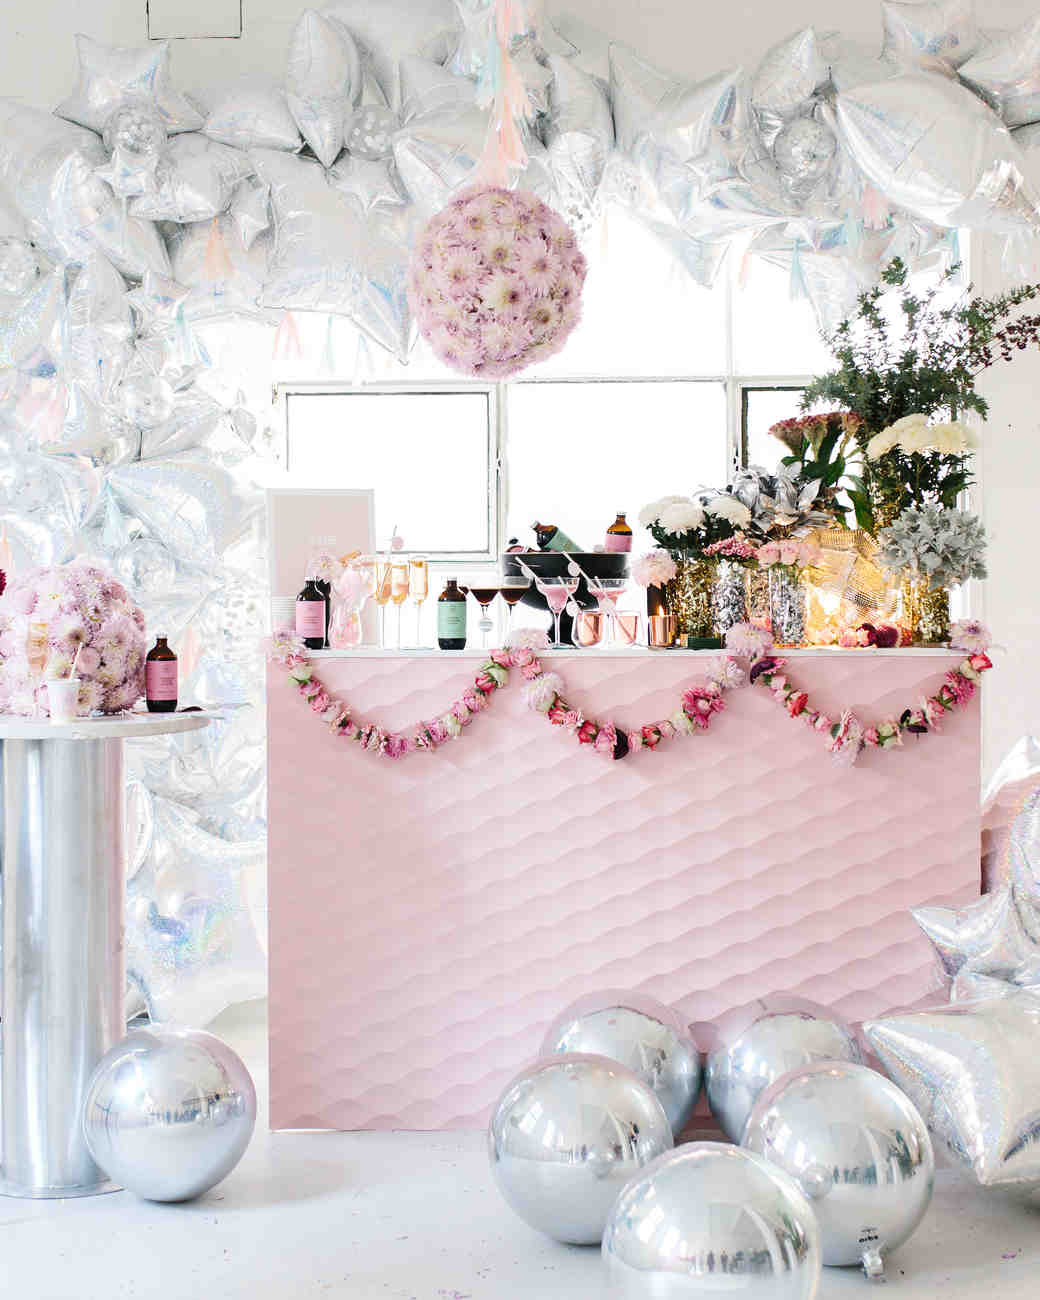 bachelorette party decoration-ის სურათის შედეგი